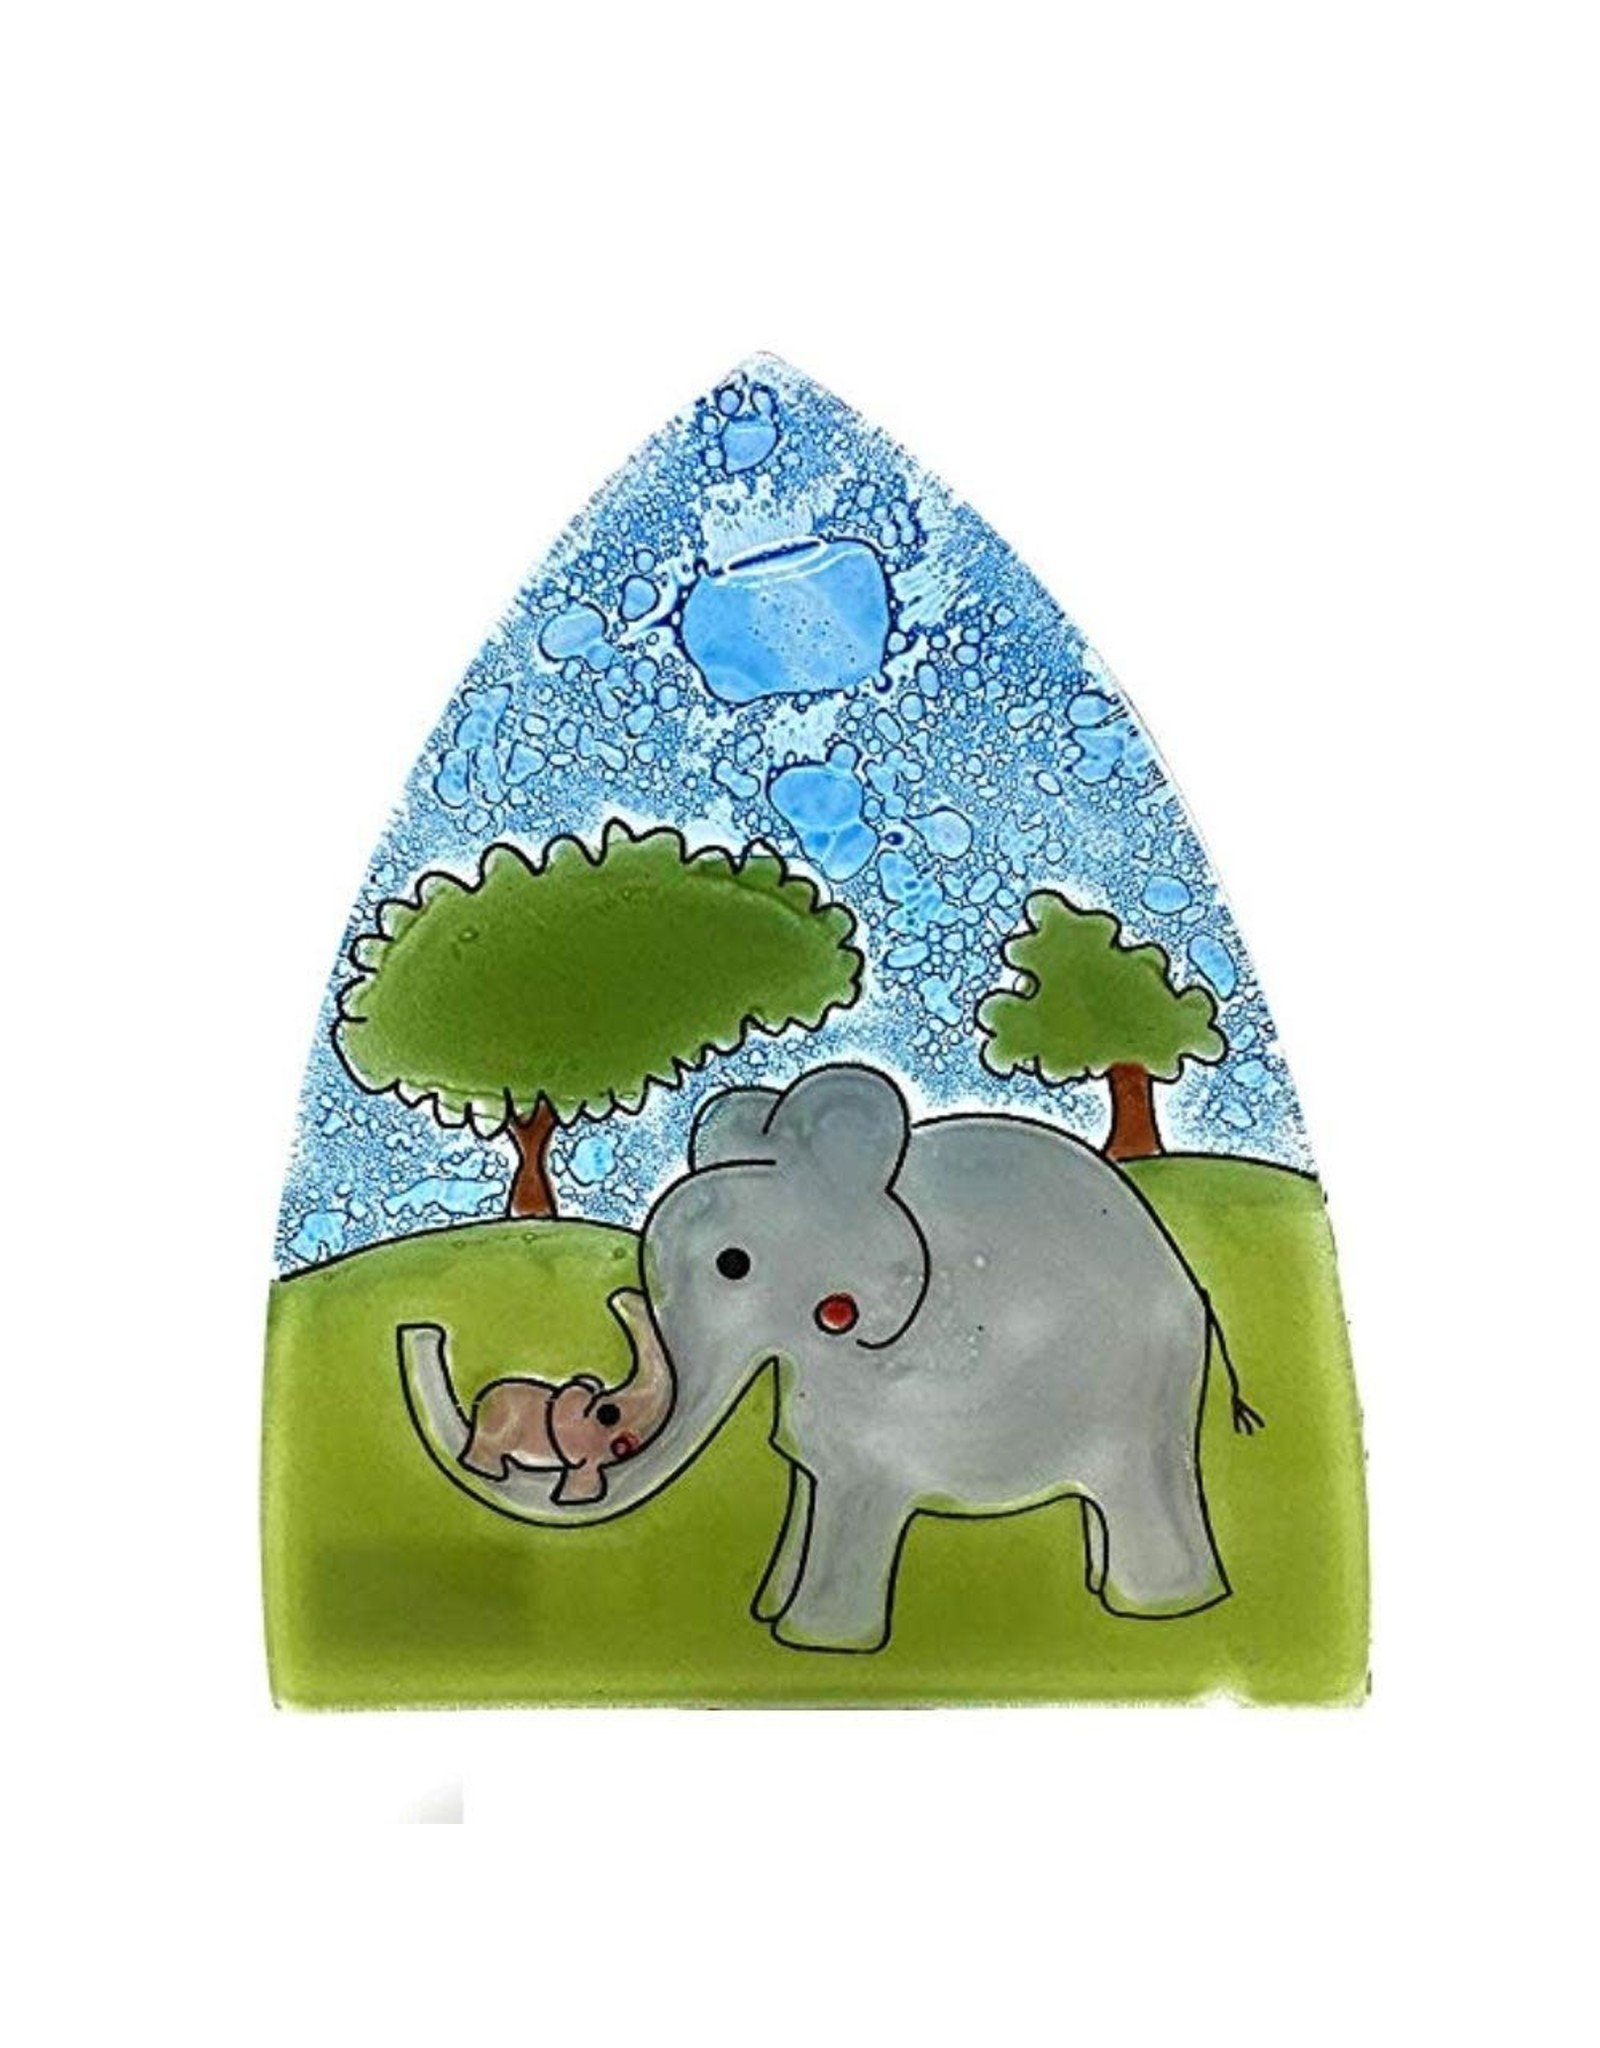 Hand Blown Glass Nightlight Enchanted Elephants, Ecuador